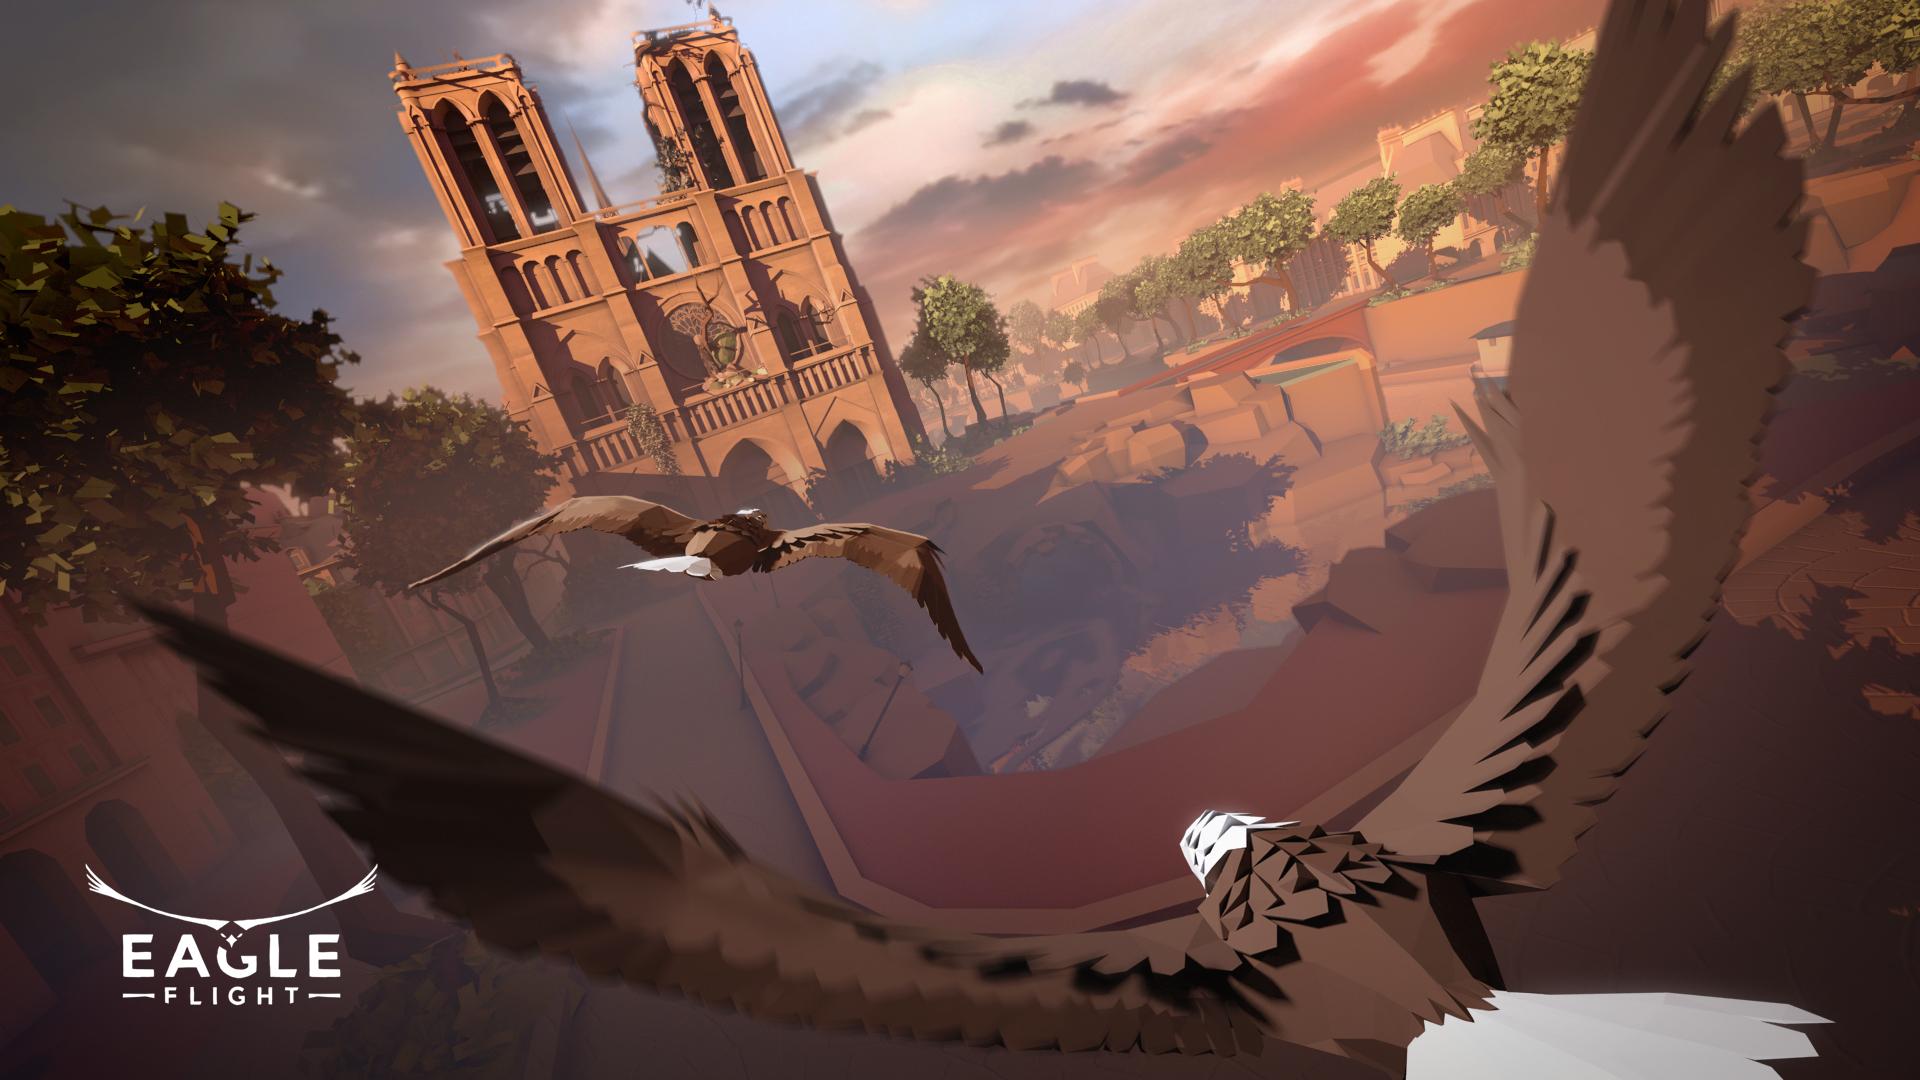 eagle flight game desktop wallpaper 61945